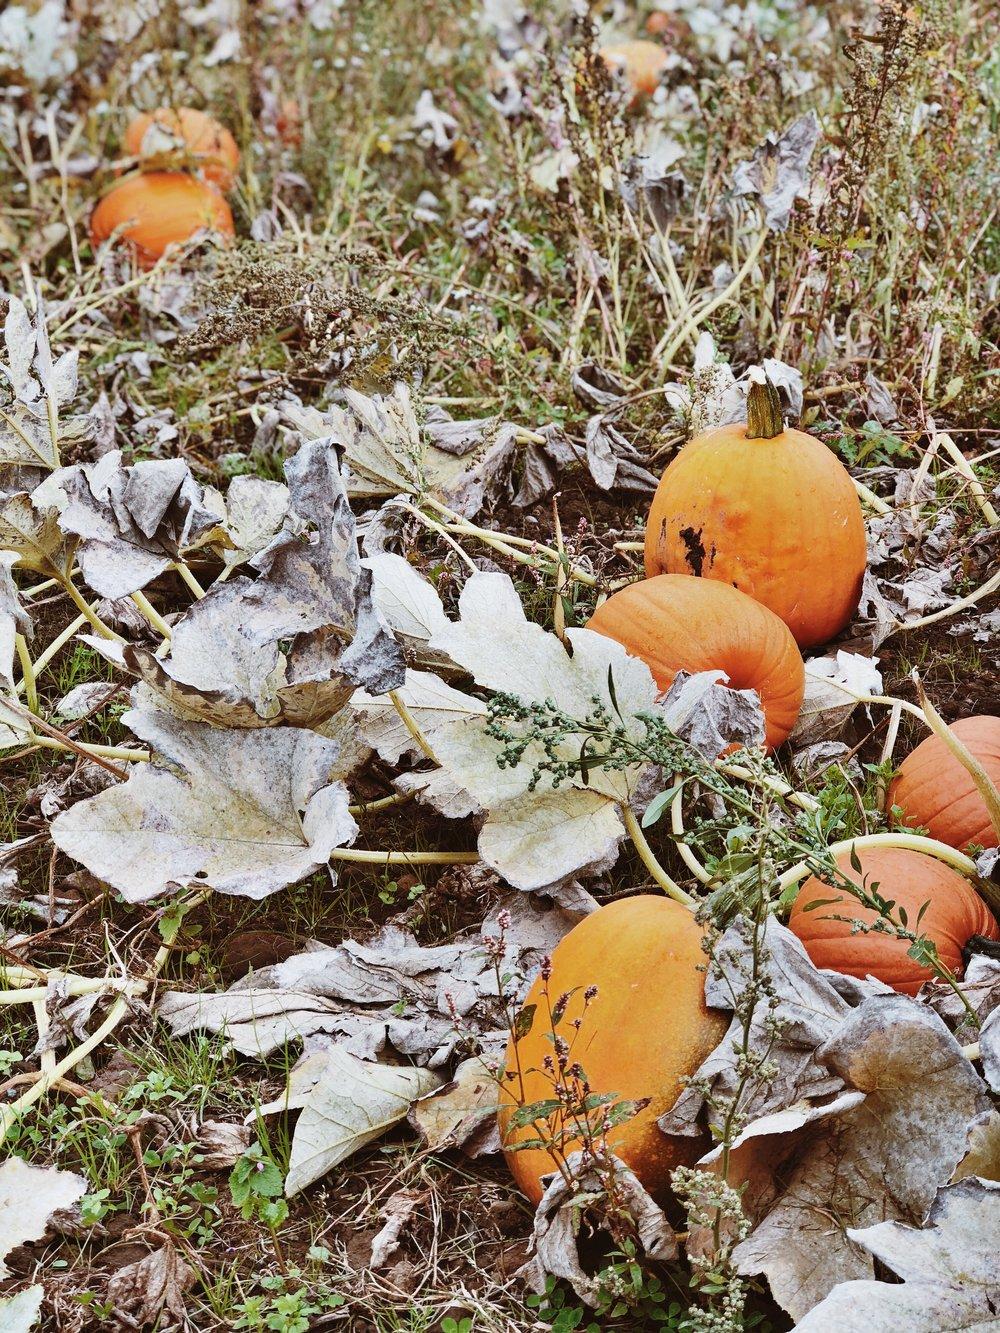 Pumpkins aplenty